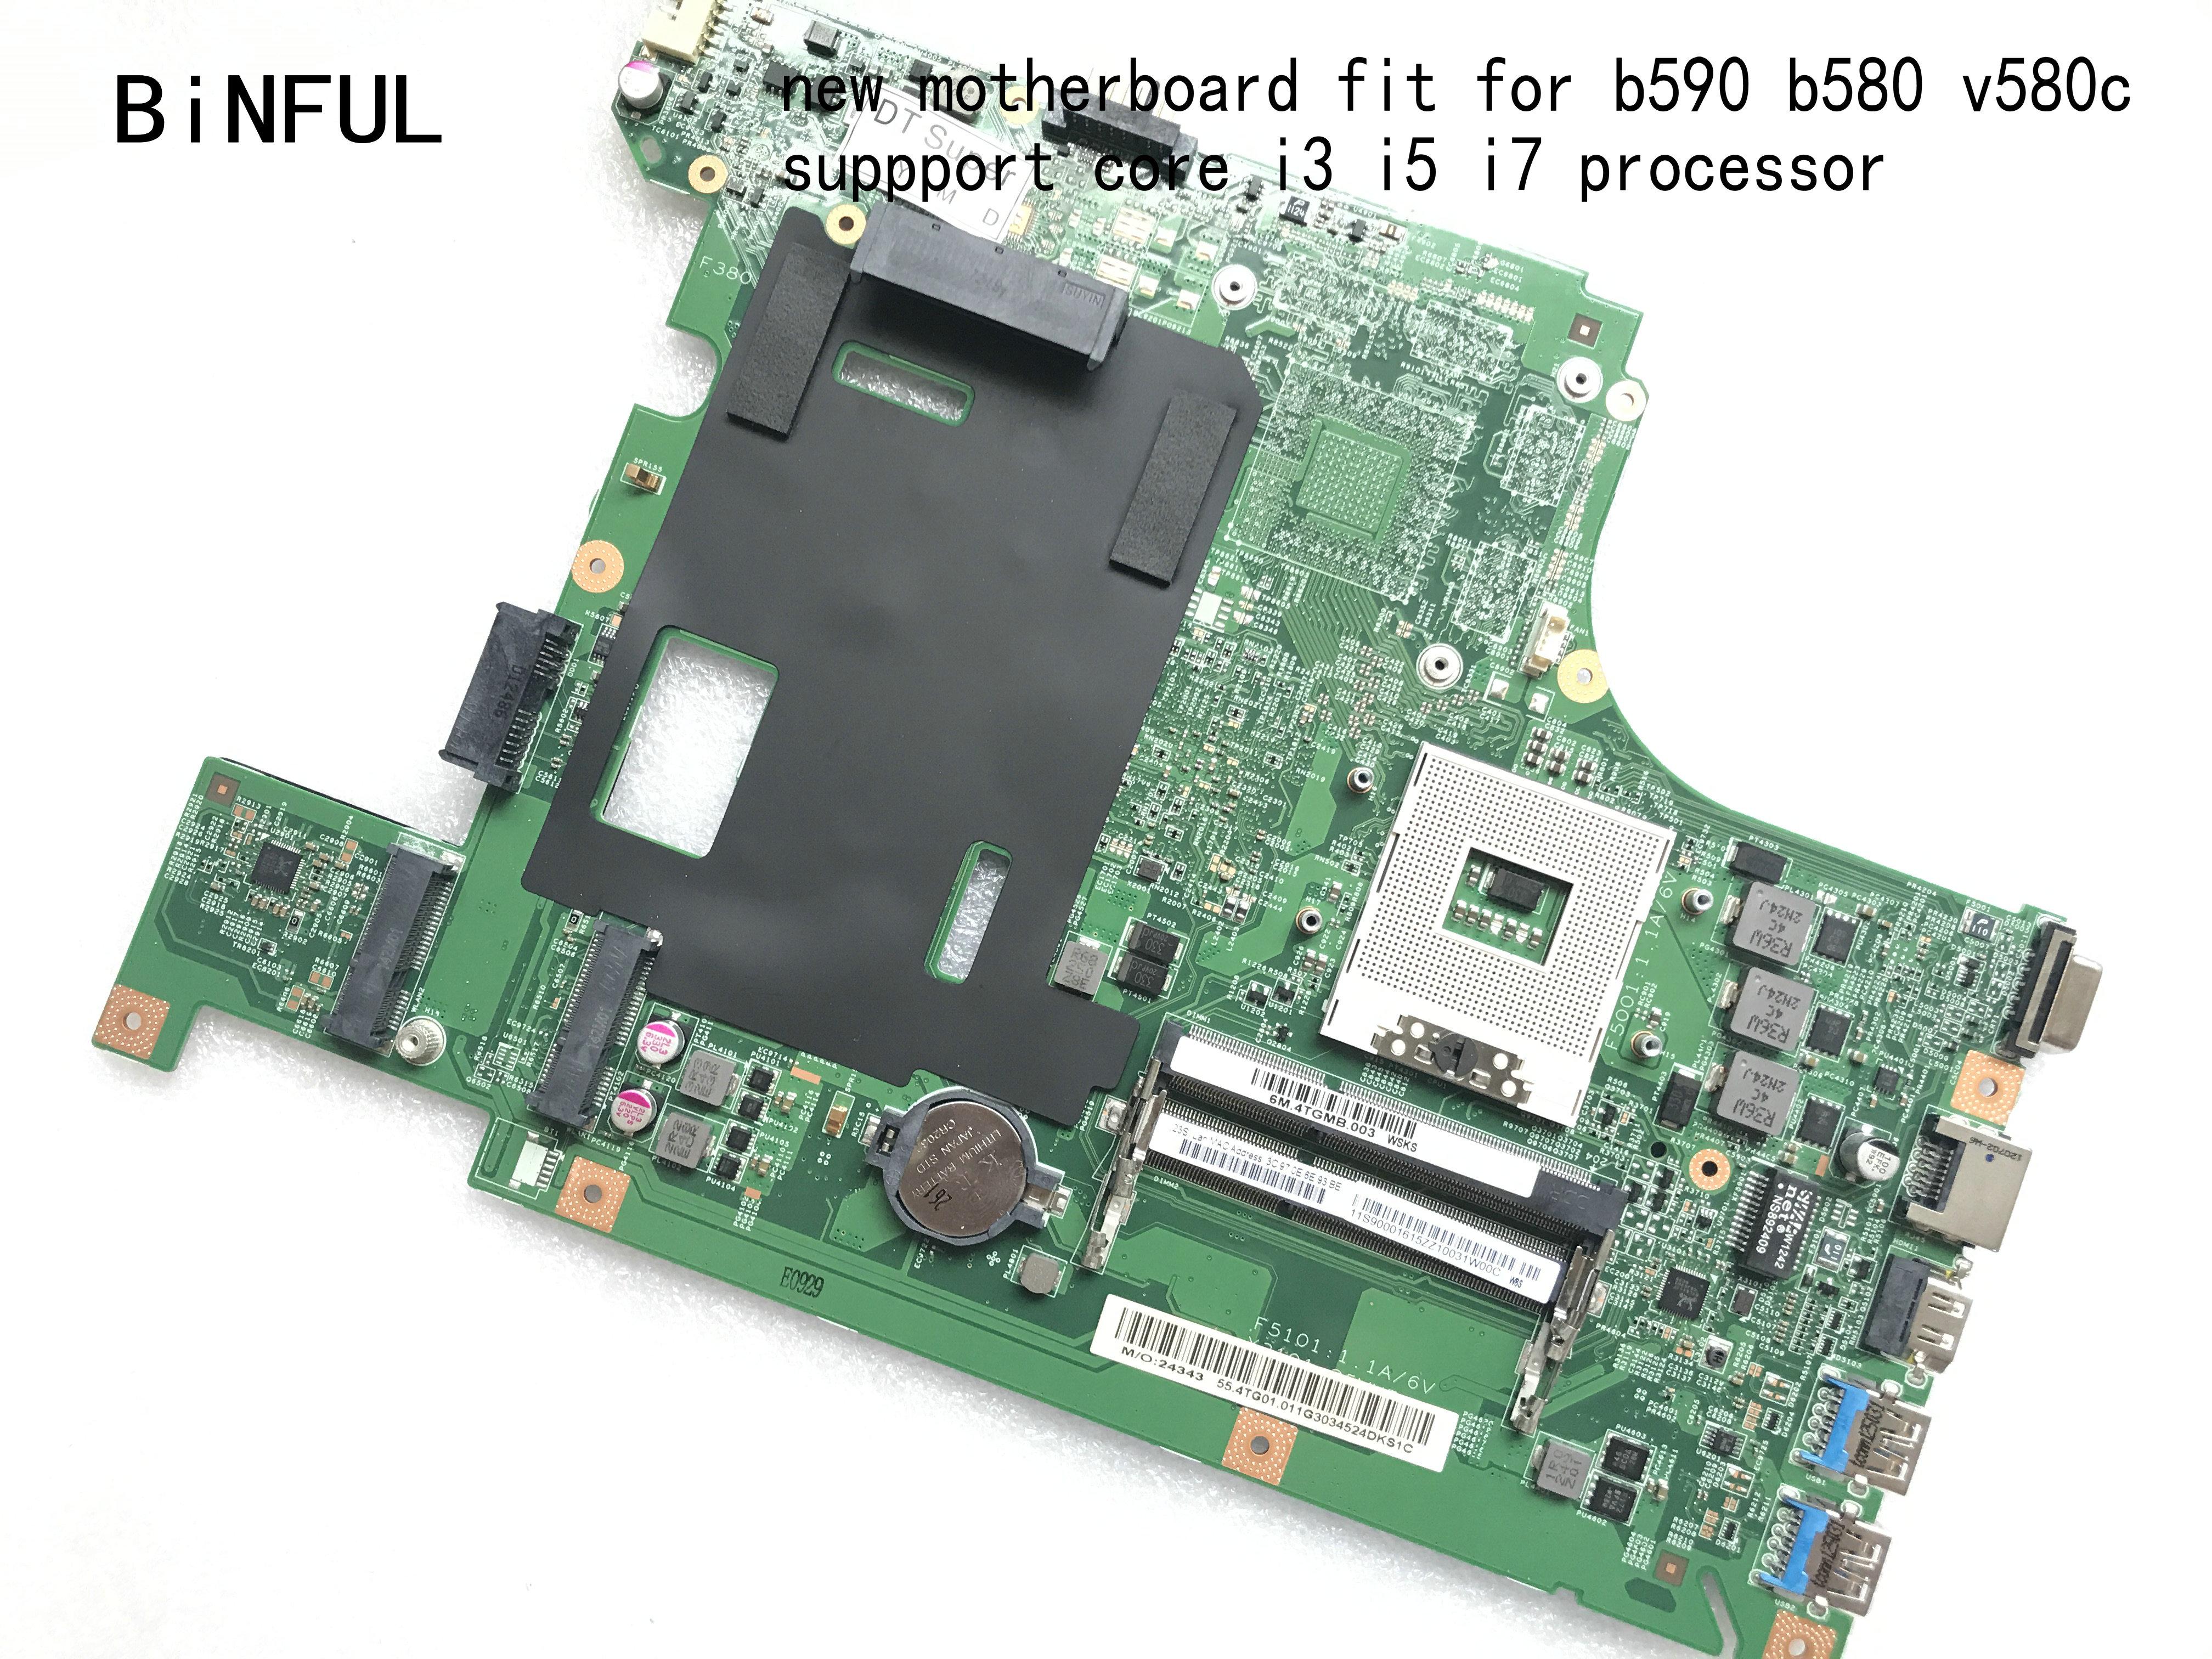 BiNFUL STOCK, LA58 11273-1 48.4TE01.011 Fit FOR LENOVO B590 / B580 V580C LAPTOP MOTHERBOARD,HM77 ,support I3, I5 ,i7 (new  Item)